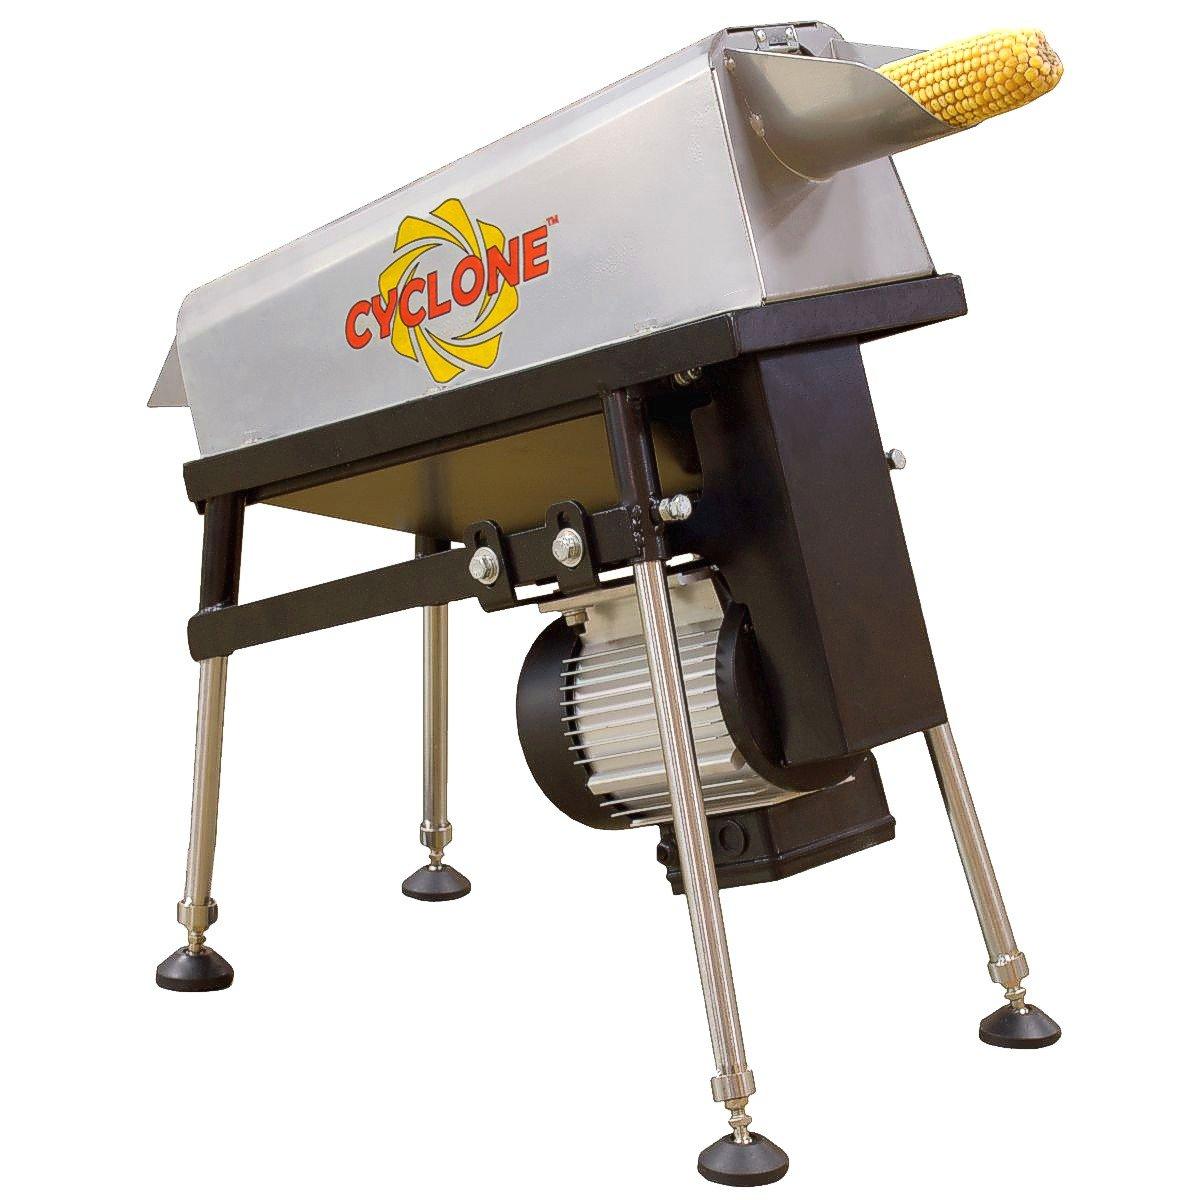 Cyclone Electric Corn Sheller by Cyclone